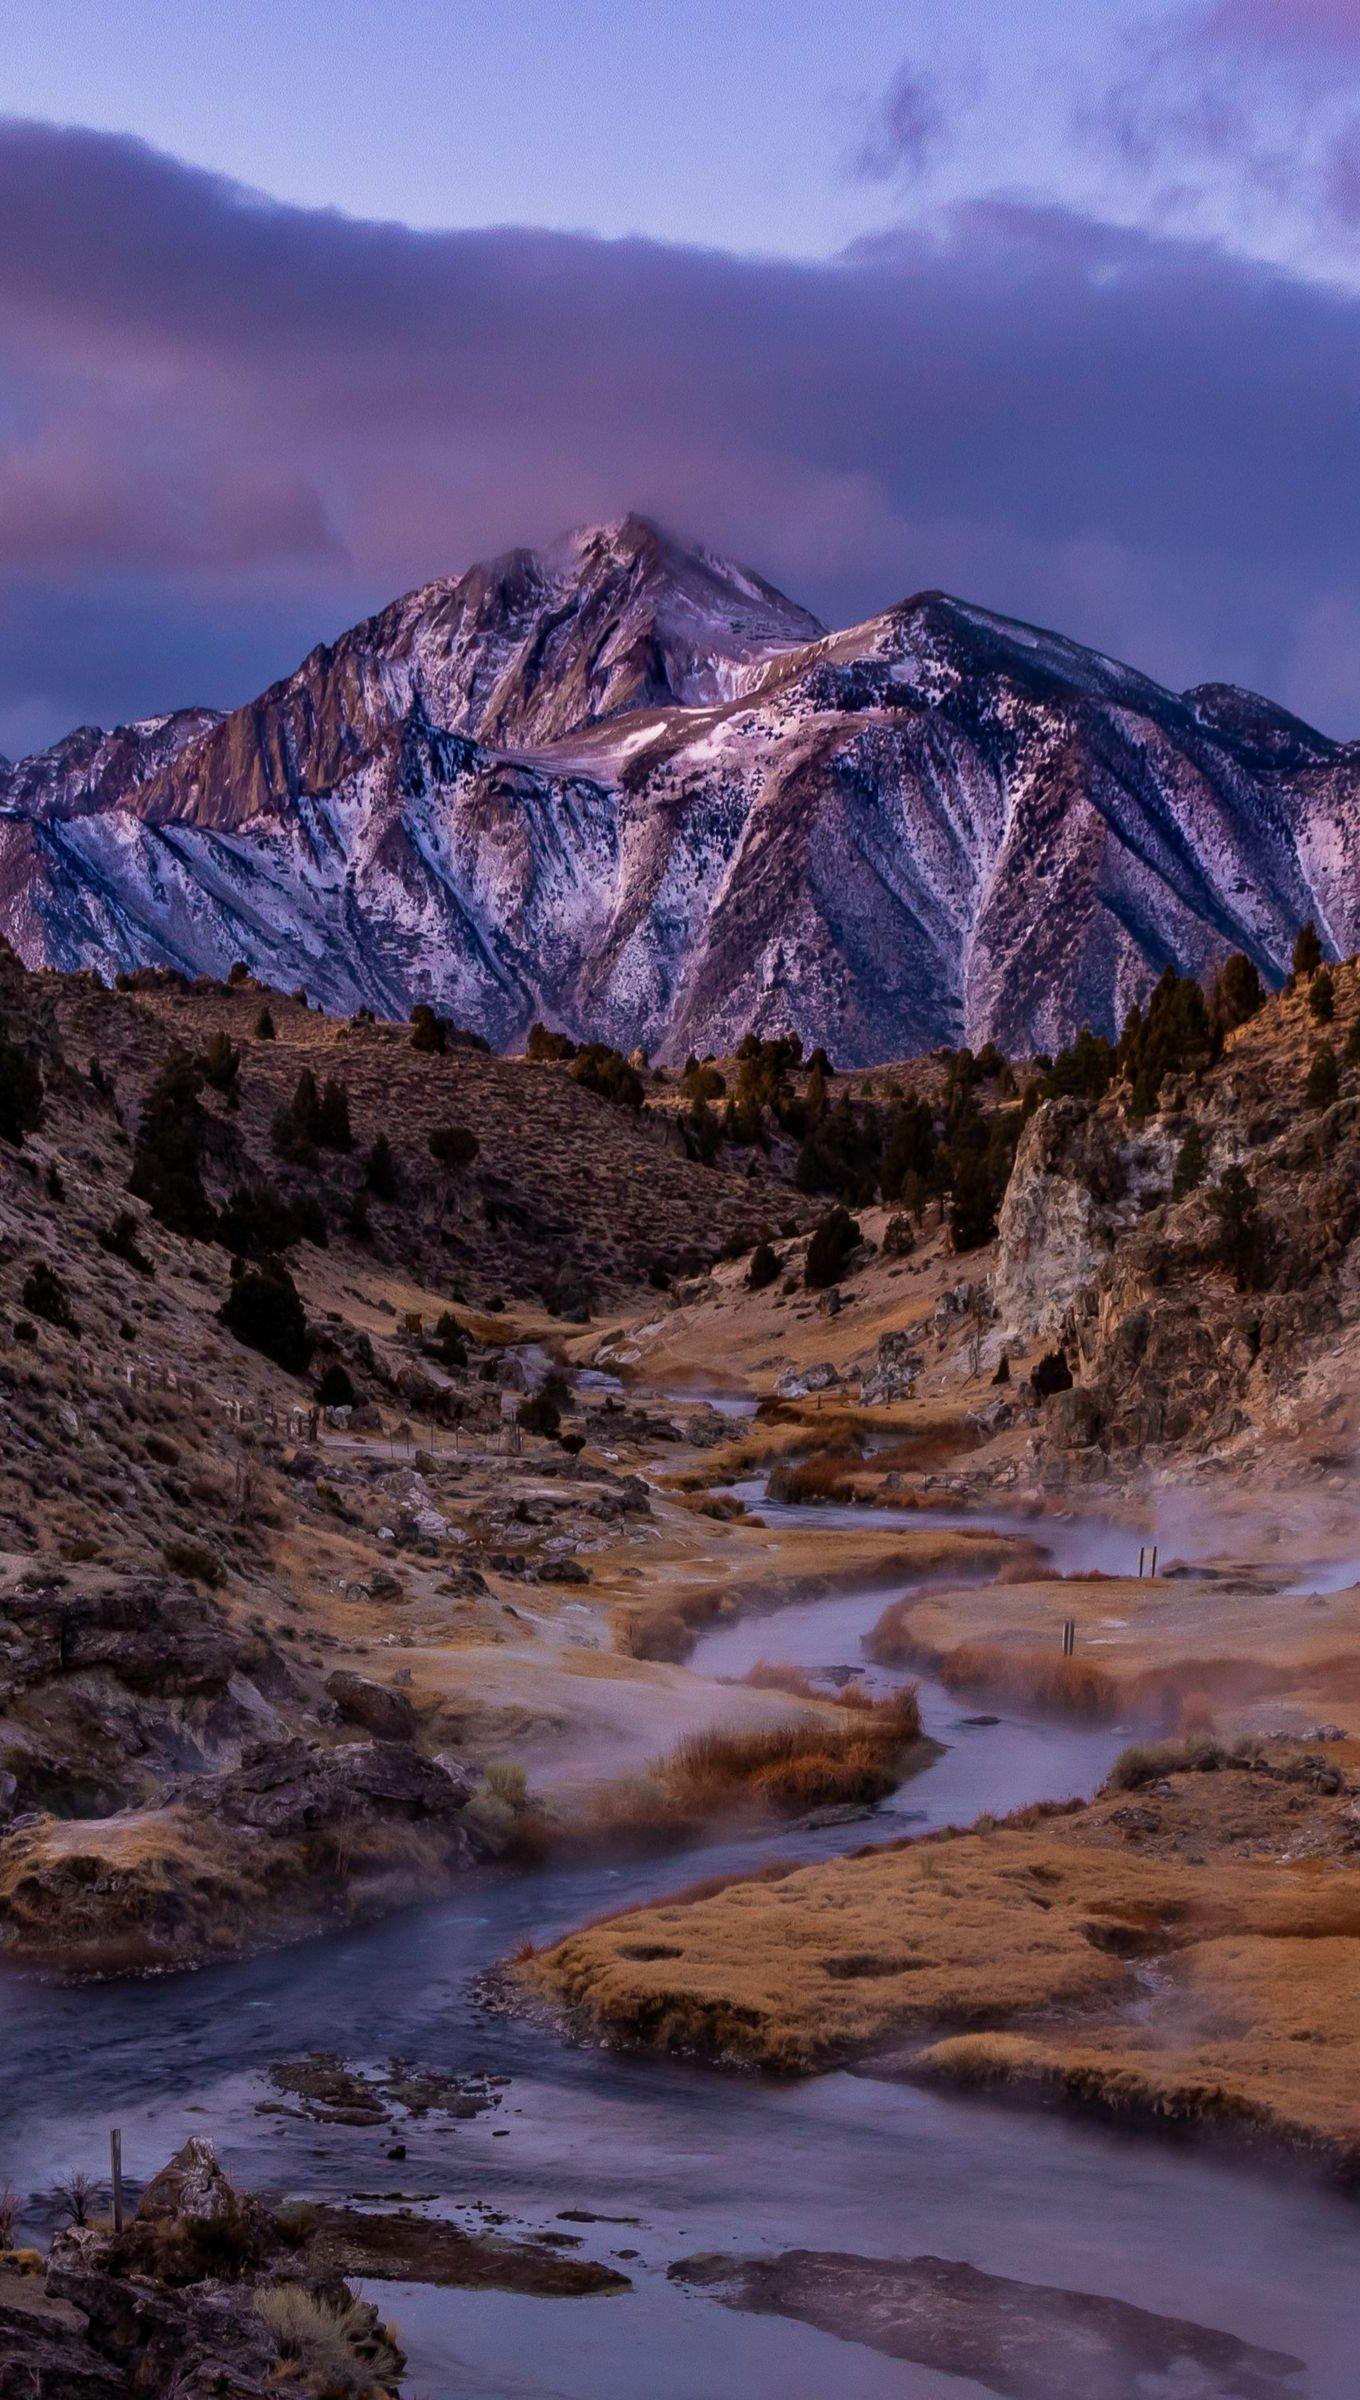 Wallpaper Mountain in cloudy scenery Vertical